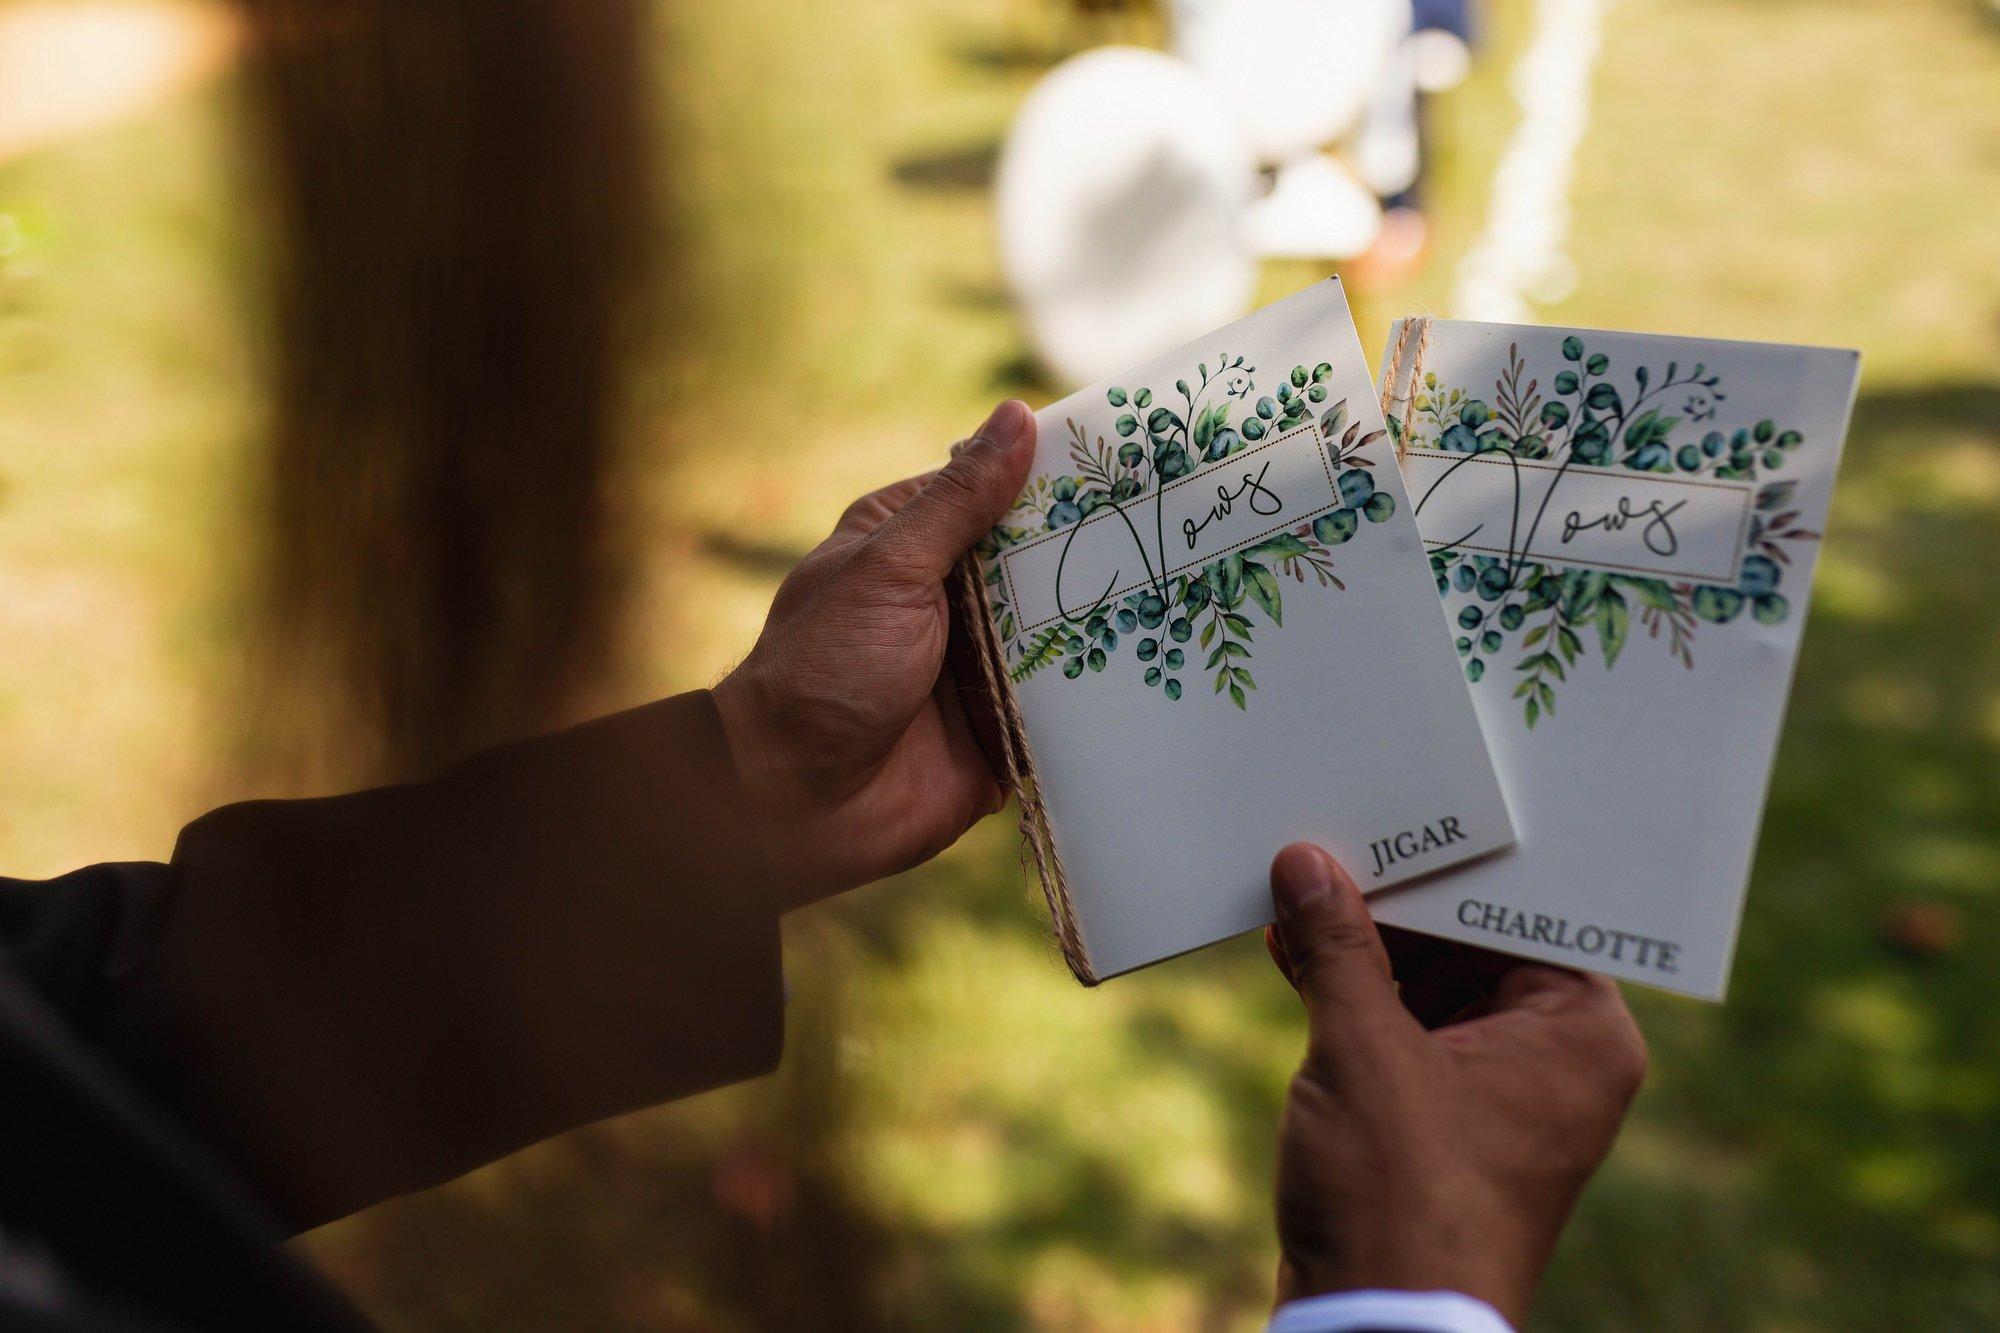 Euridge Manor, Cotswolds, civil ceremony, vows book, Cotswolds wedding photographer